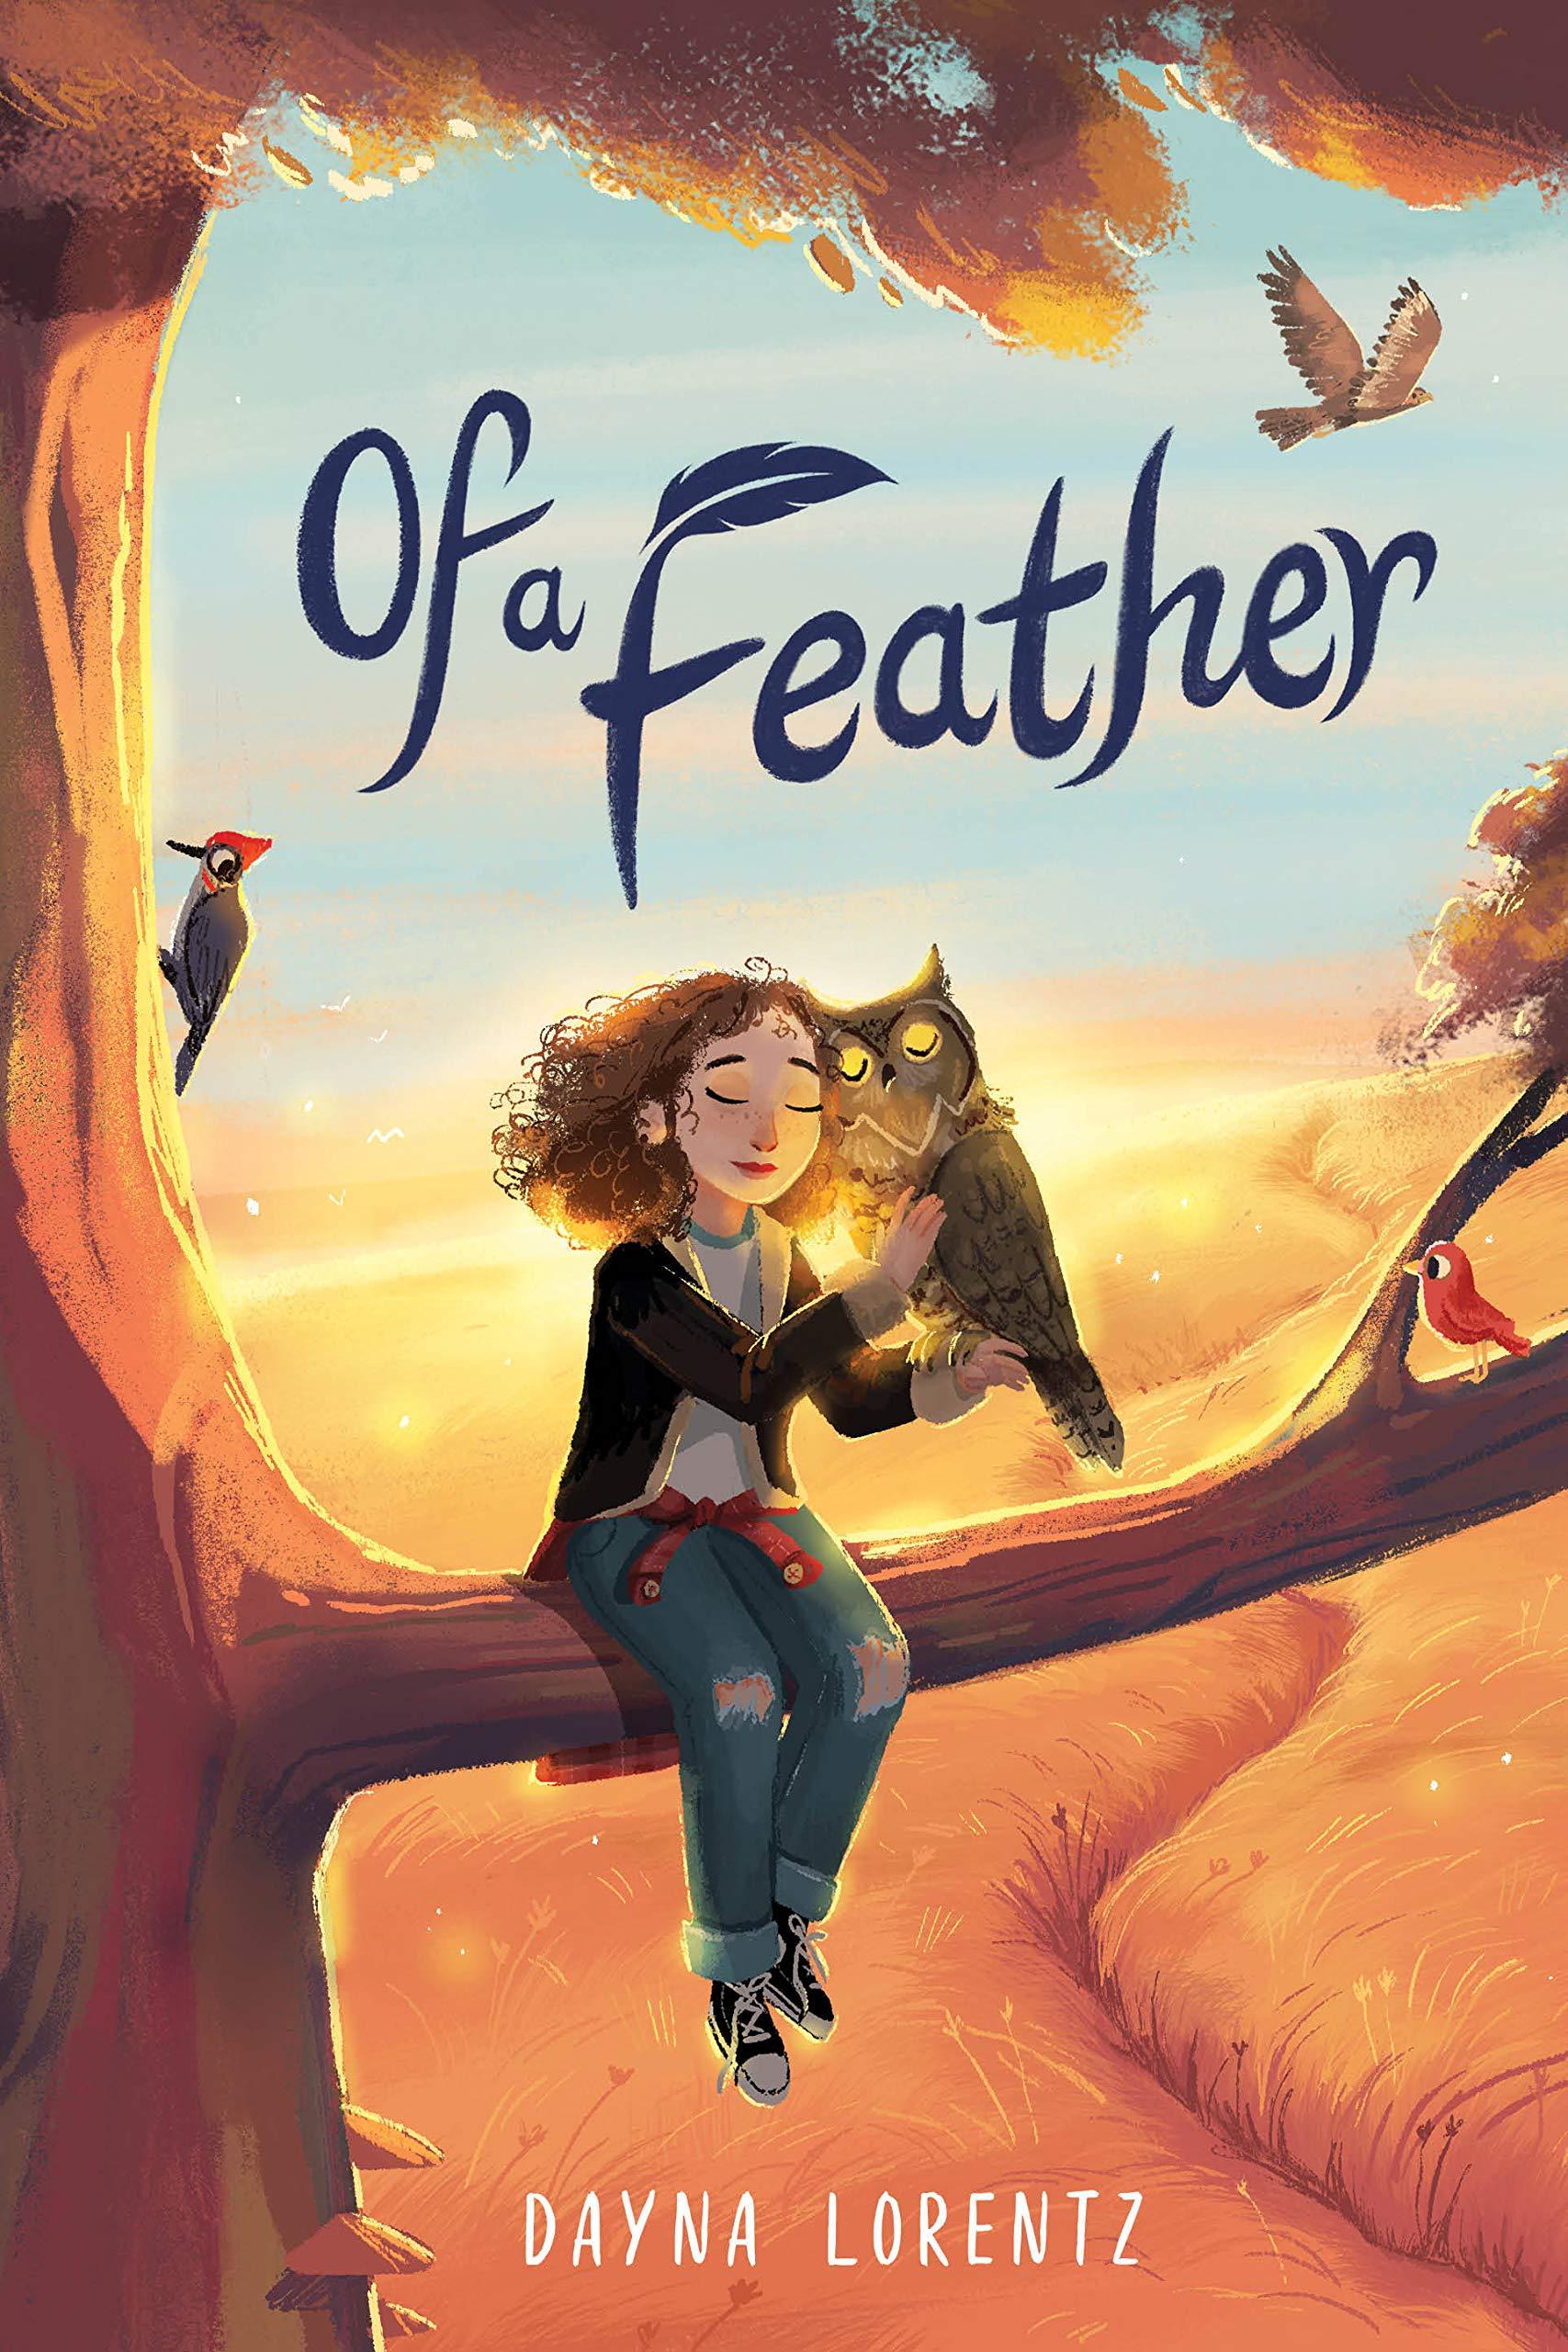 Of a Feather: Lorentz, Dayna: 9780358283539: Amazon.com: Books